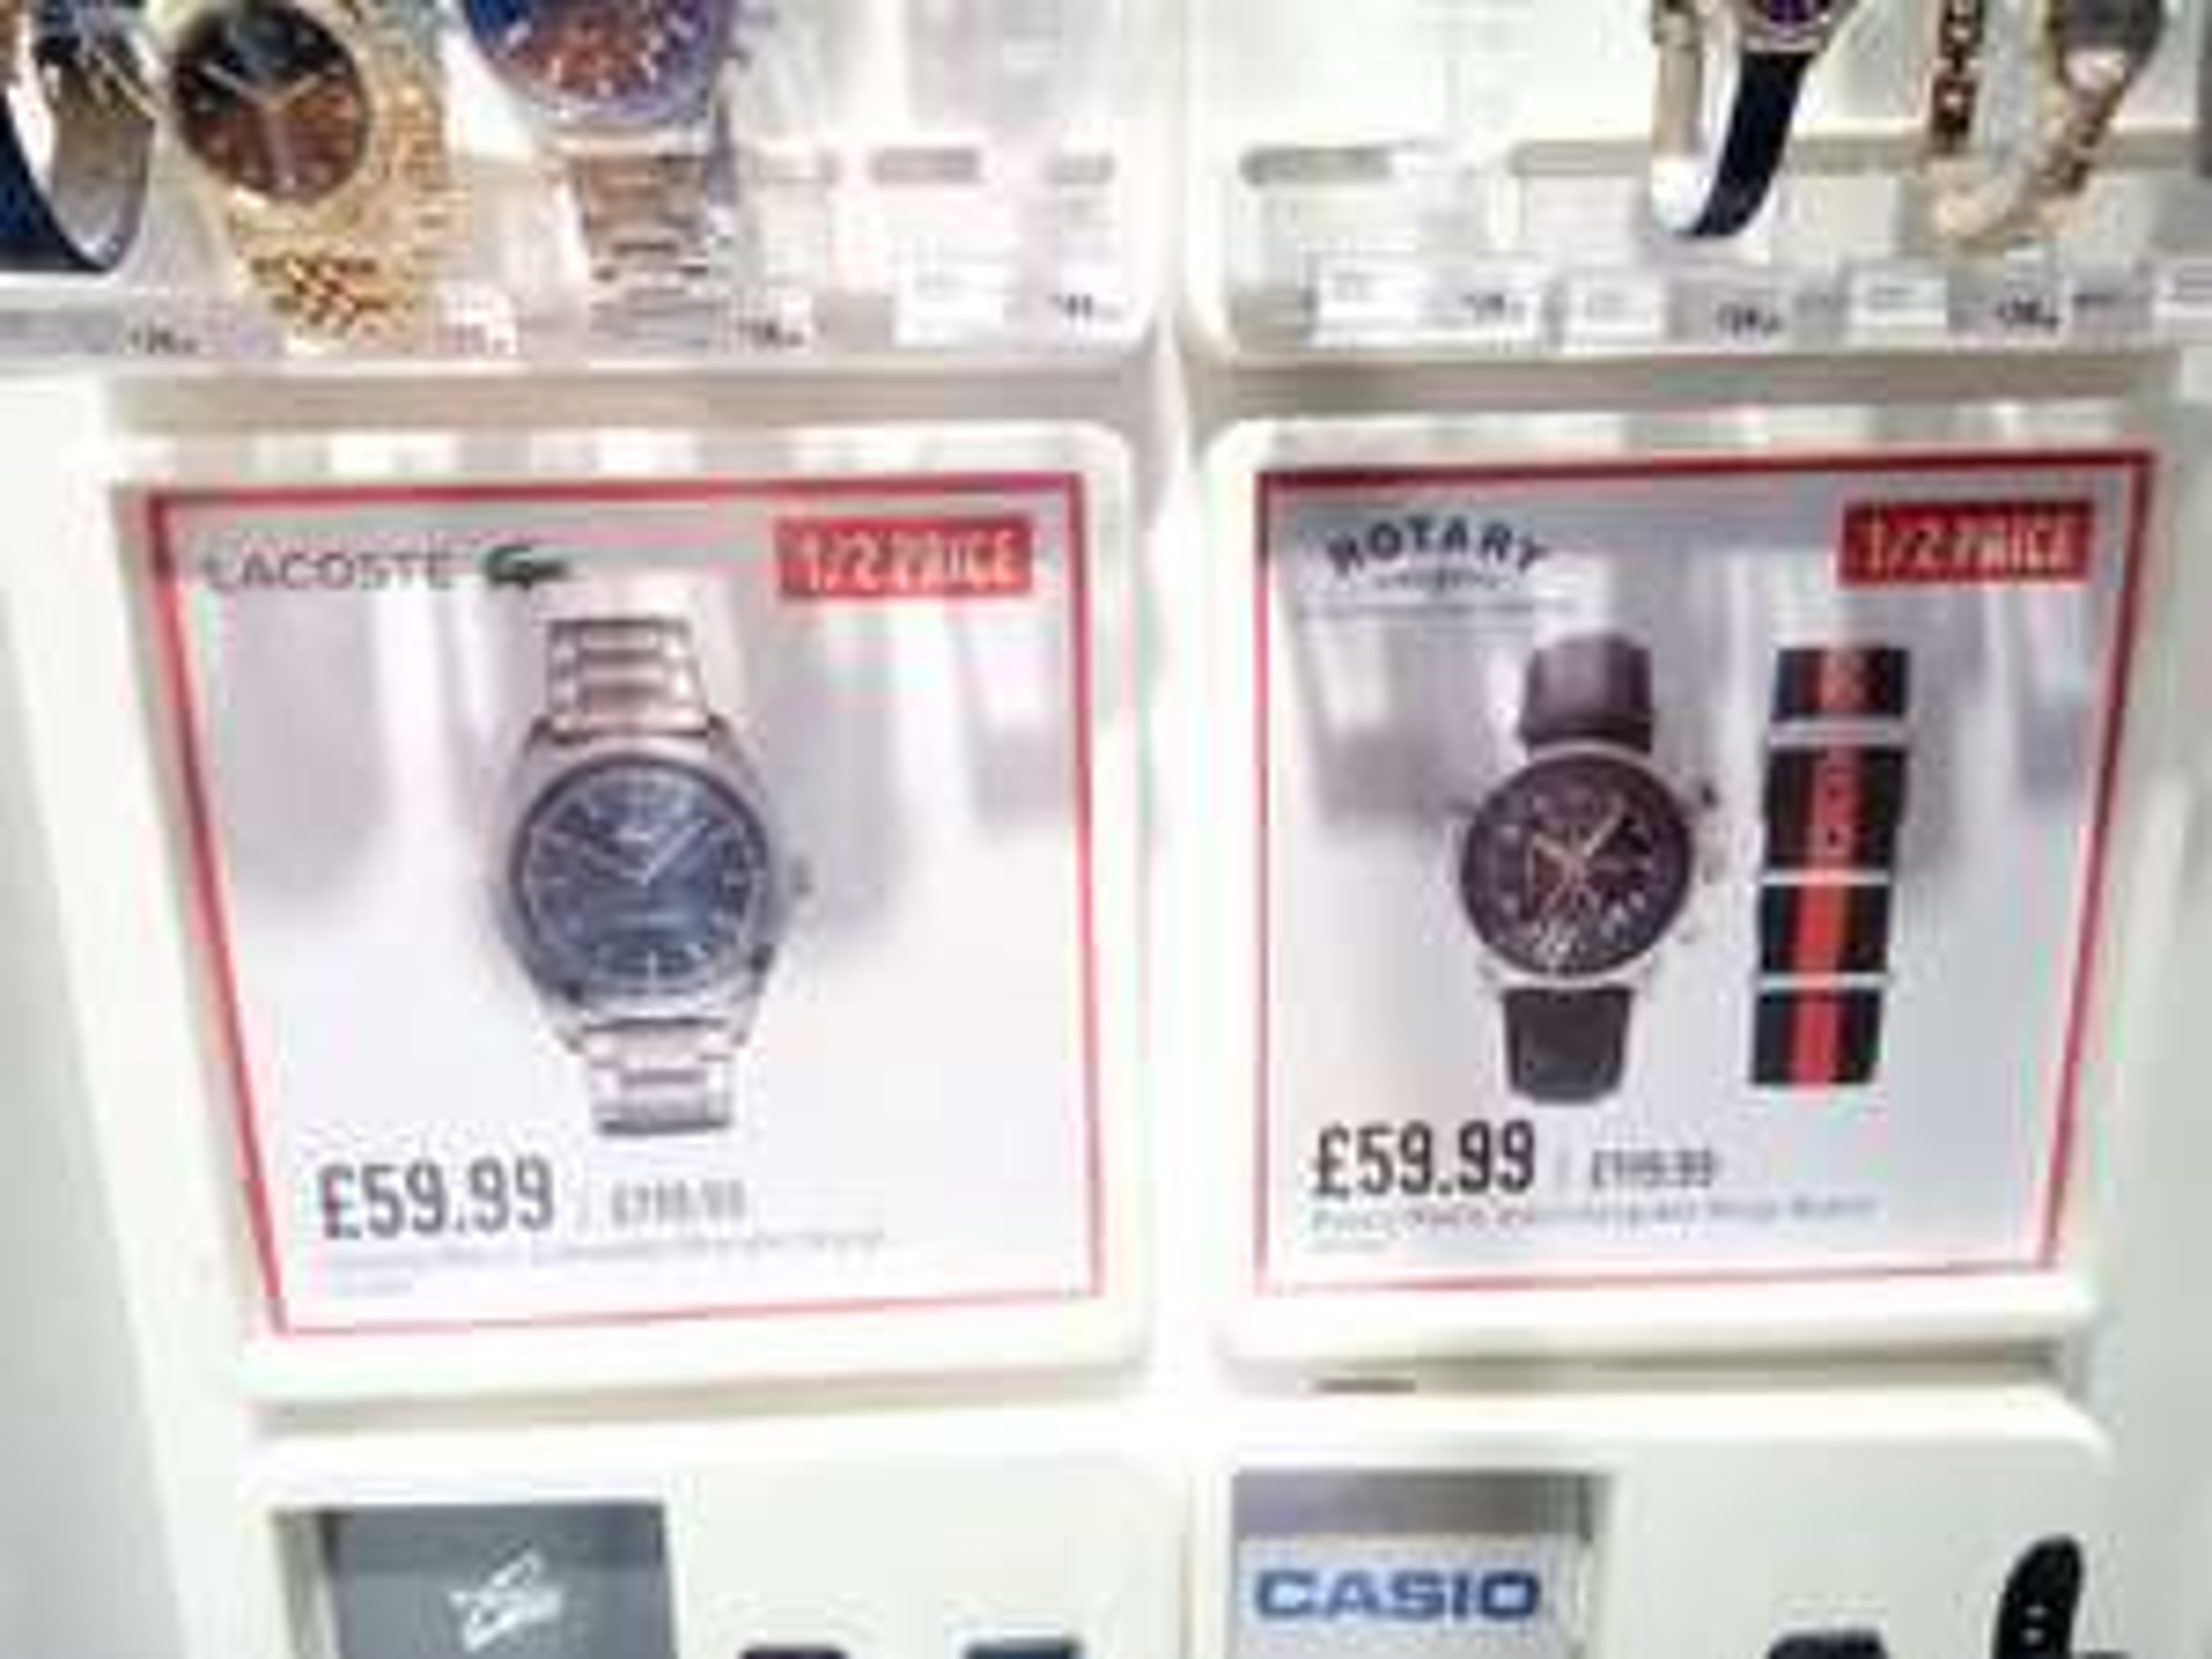 Lacoste Men's Edmonton Bracelet Watch @ Argos for £59.99 (online & instore)